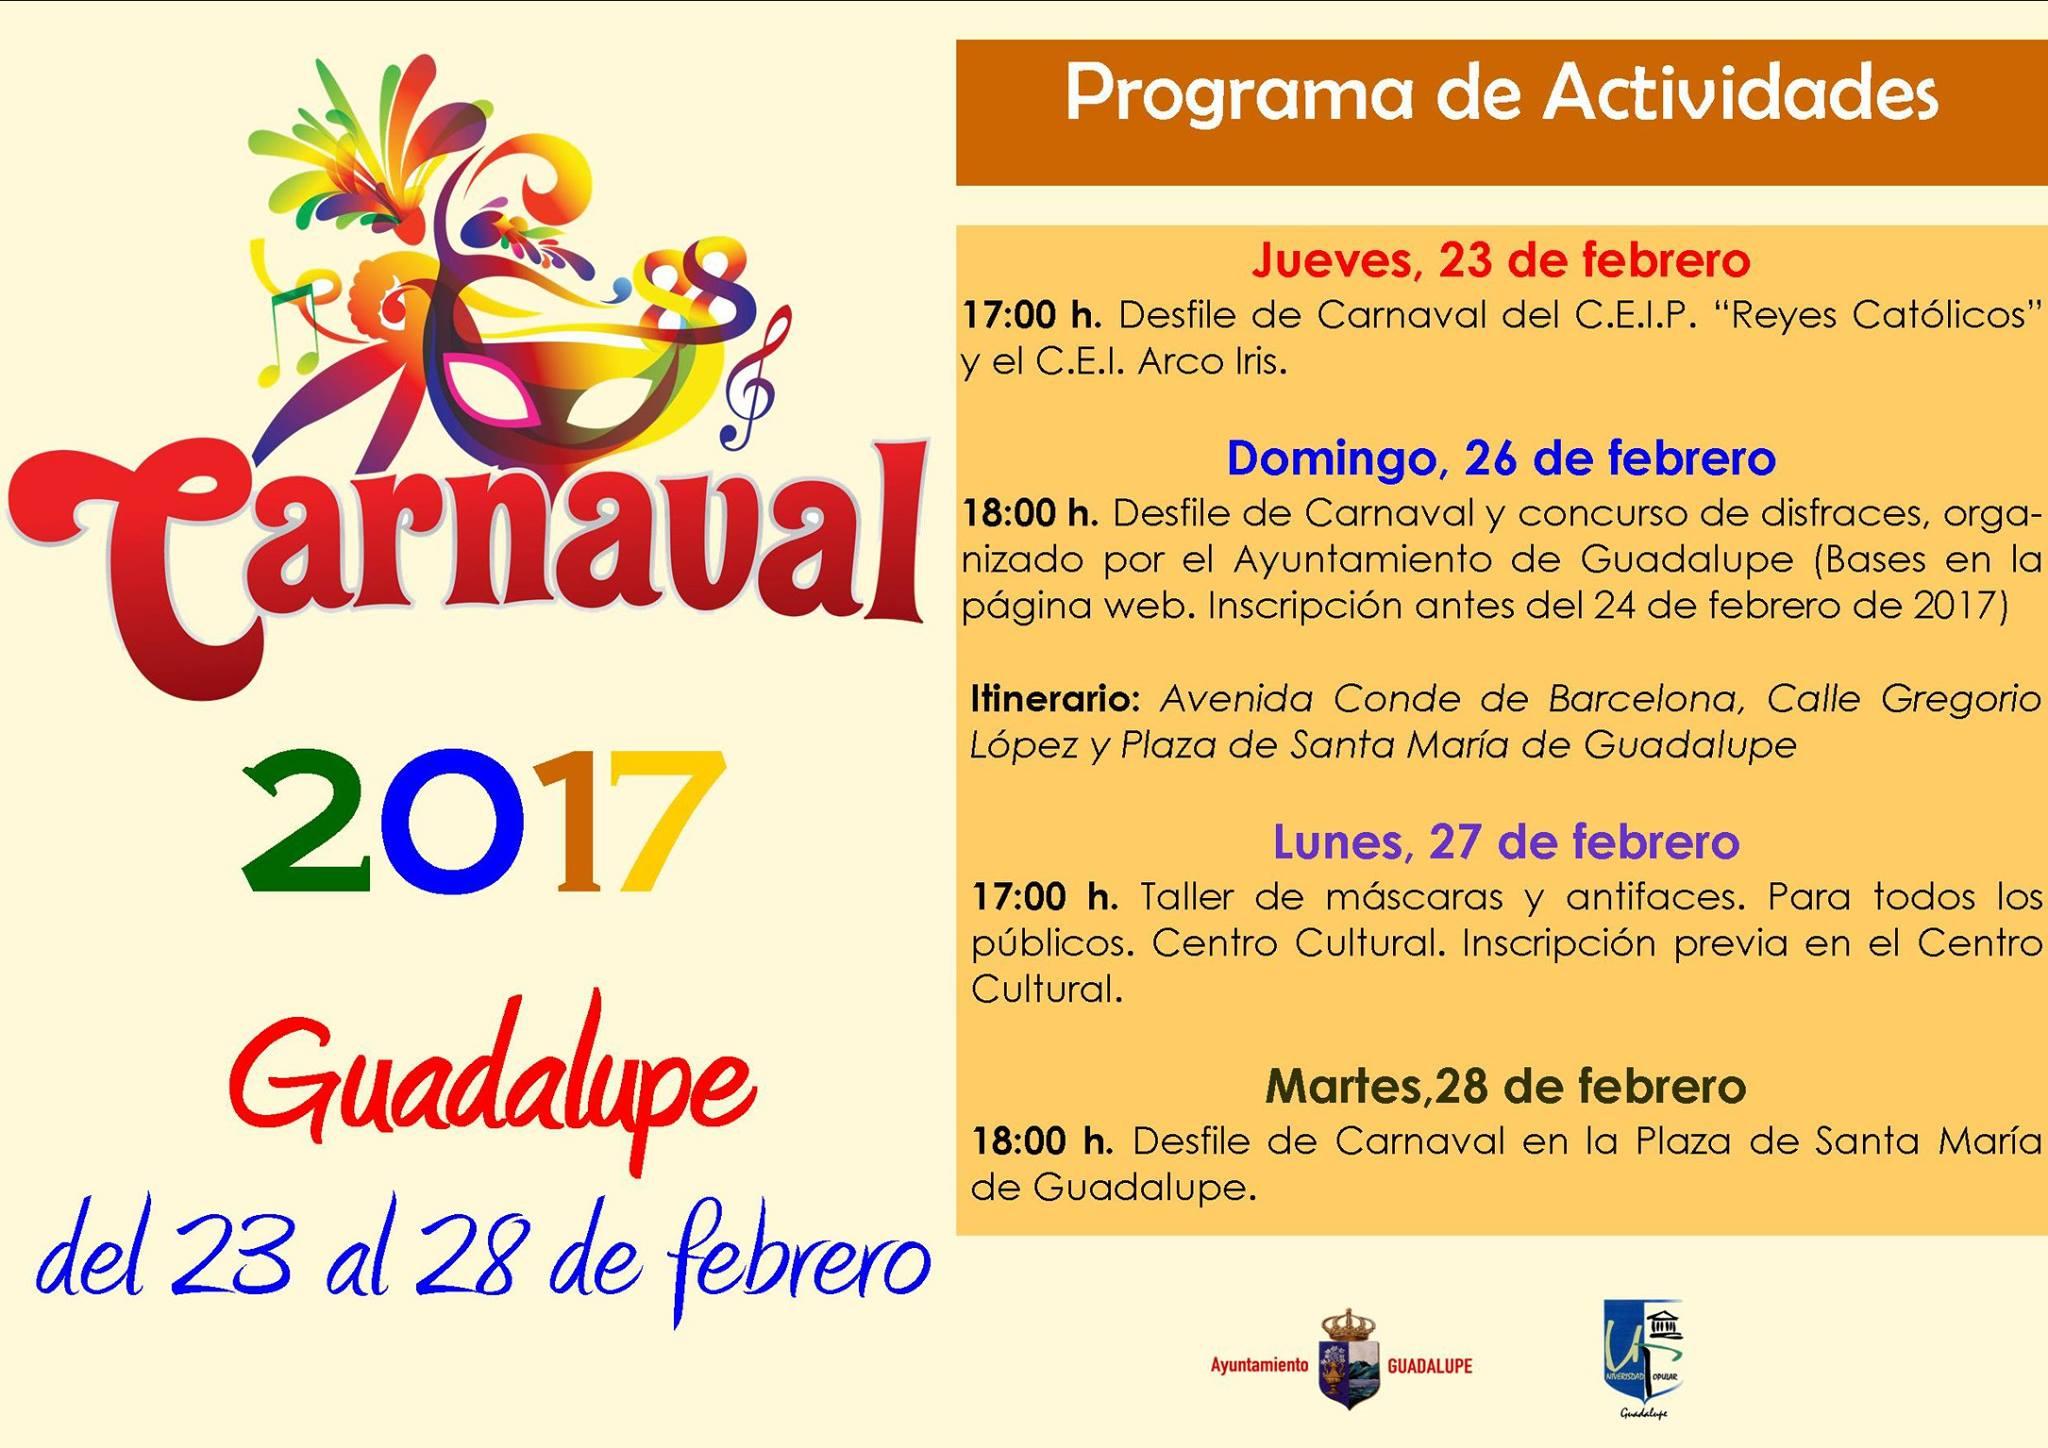 Carnaval 2017 - Guadalupe